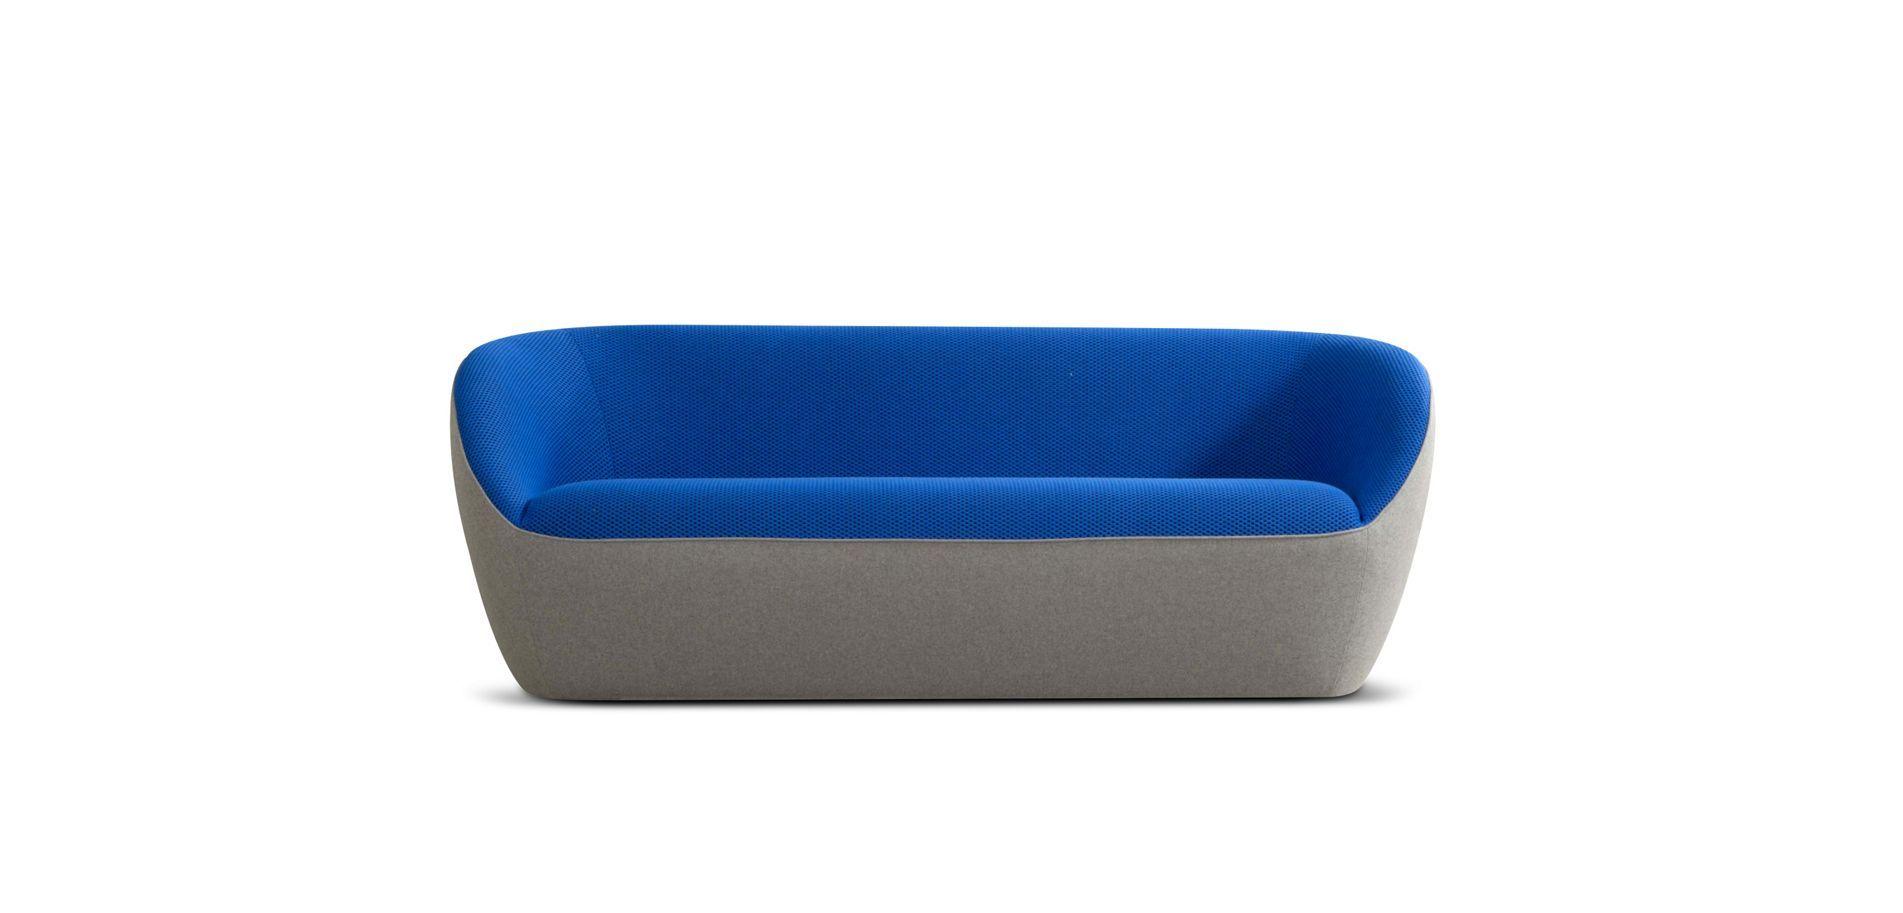 Edito 2 Seat Sofa Sofas Sofa Beds Roche Bobois